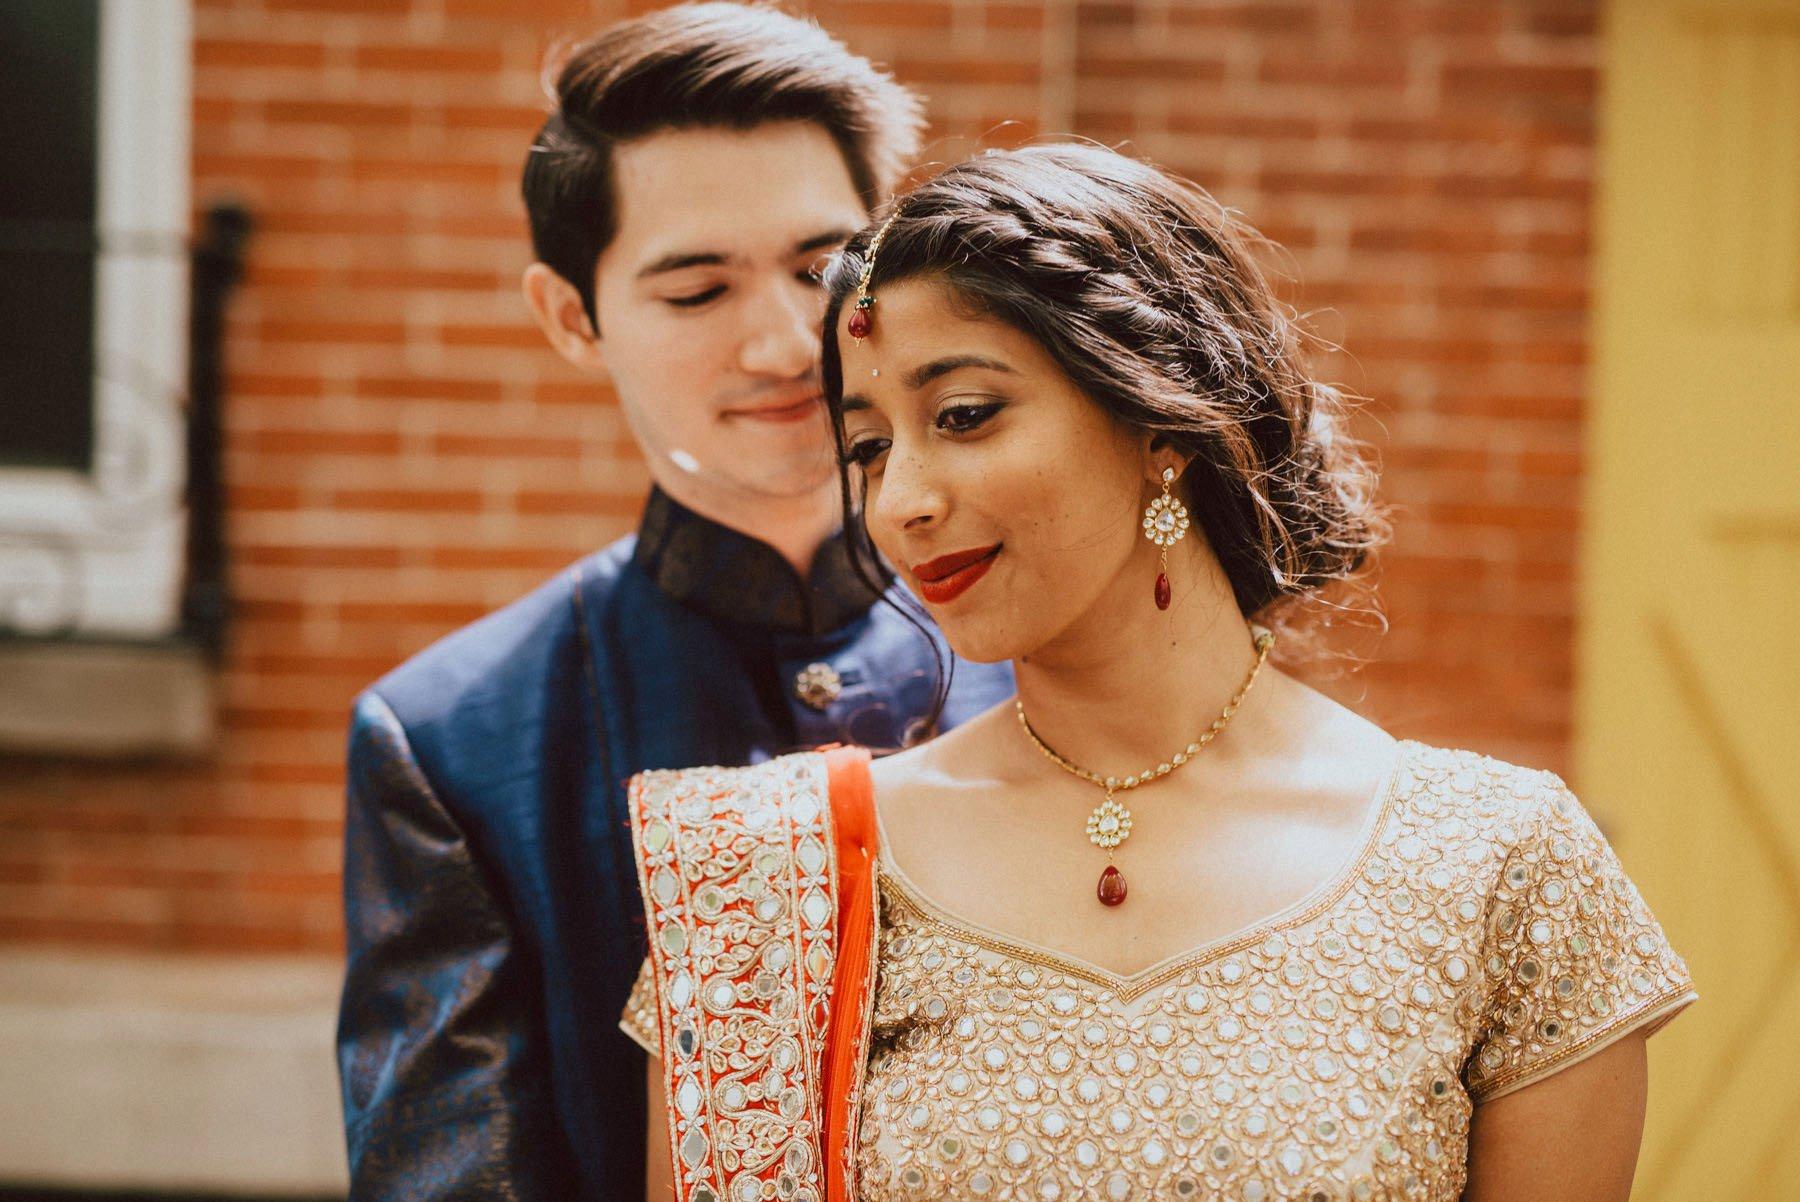 vie-philadelphia-indian-wedding-34.jpg